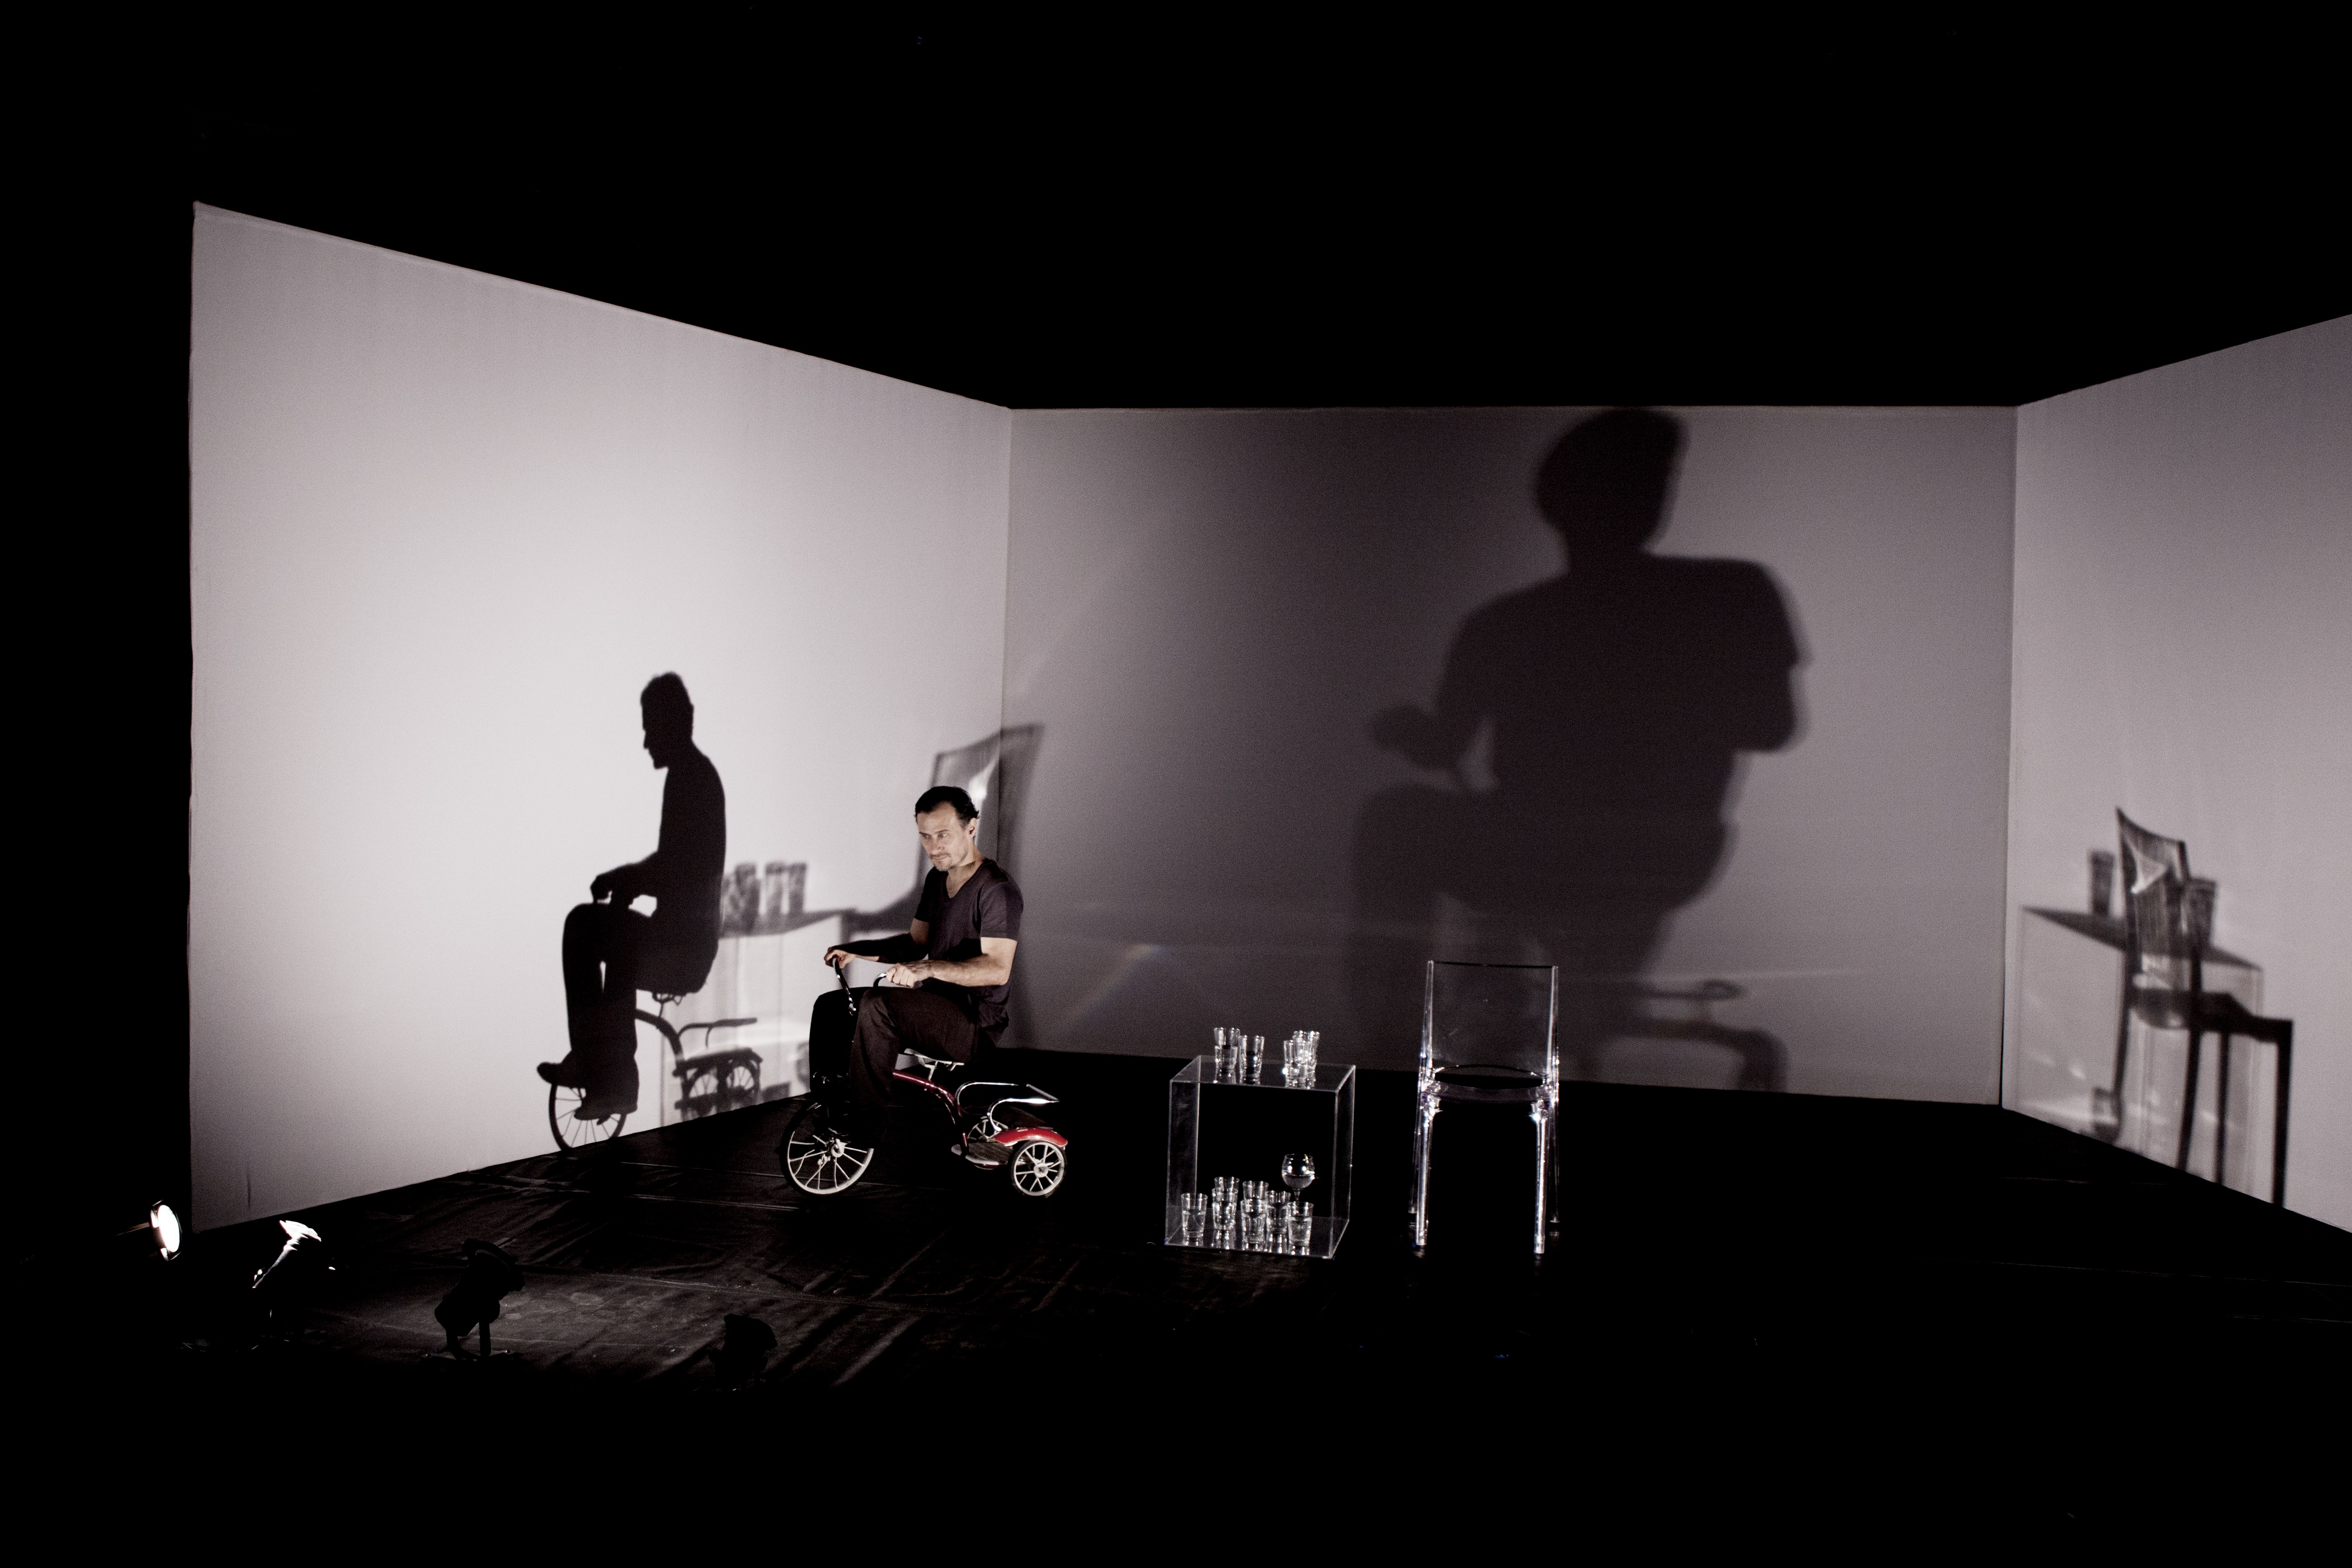 Cine Monstro, de Daniel MacIvor, com Enrique Diaz